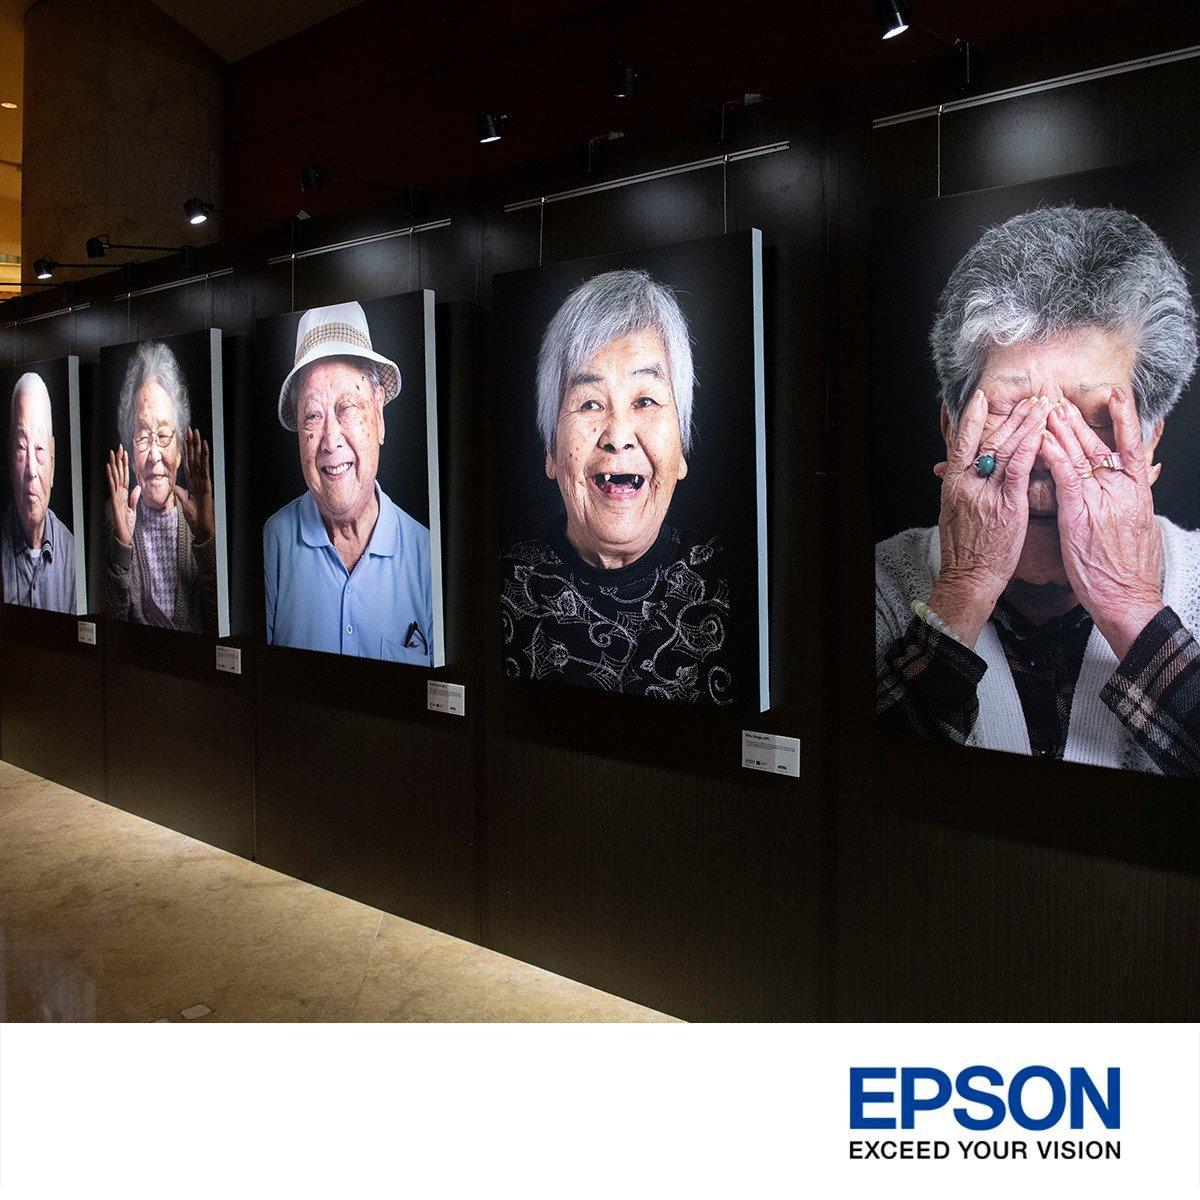 Epson printer photography exhibition singapore Okinawa portrait